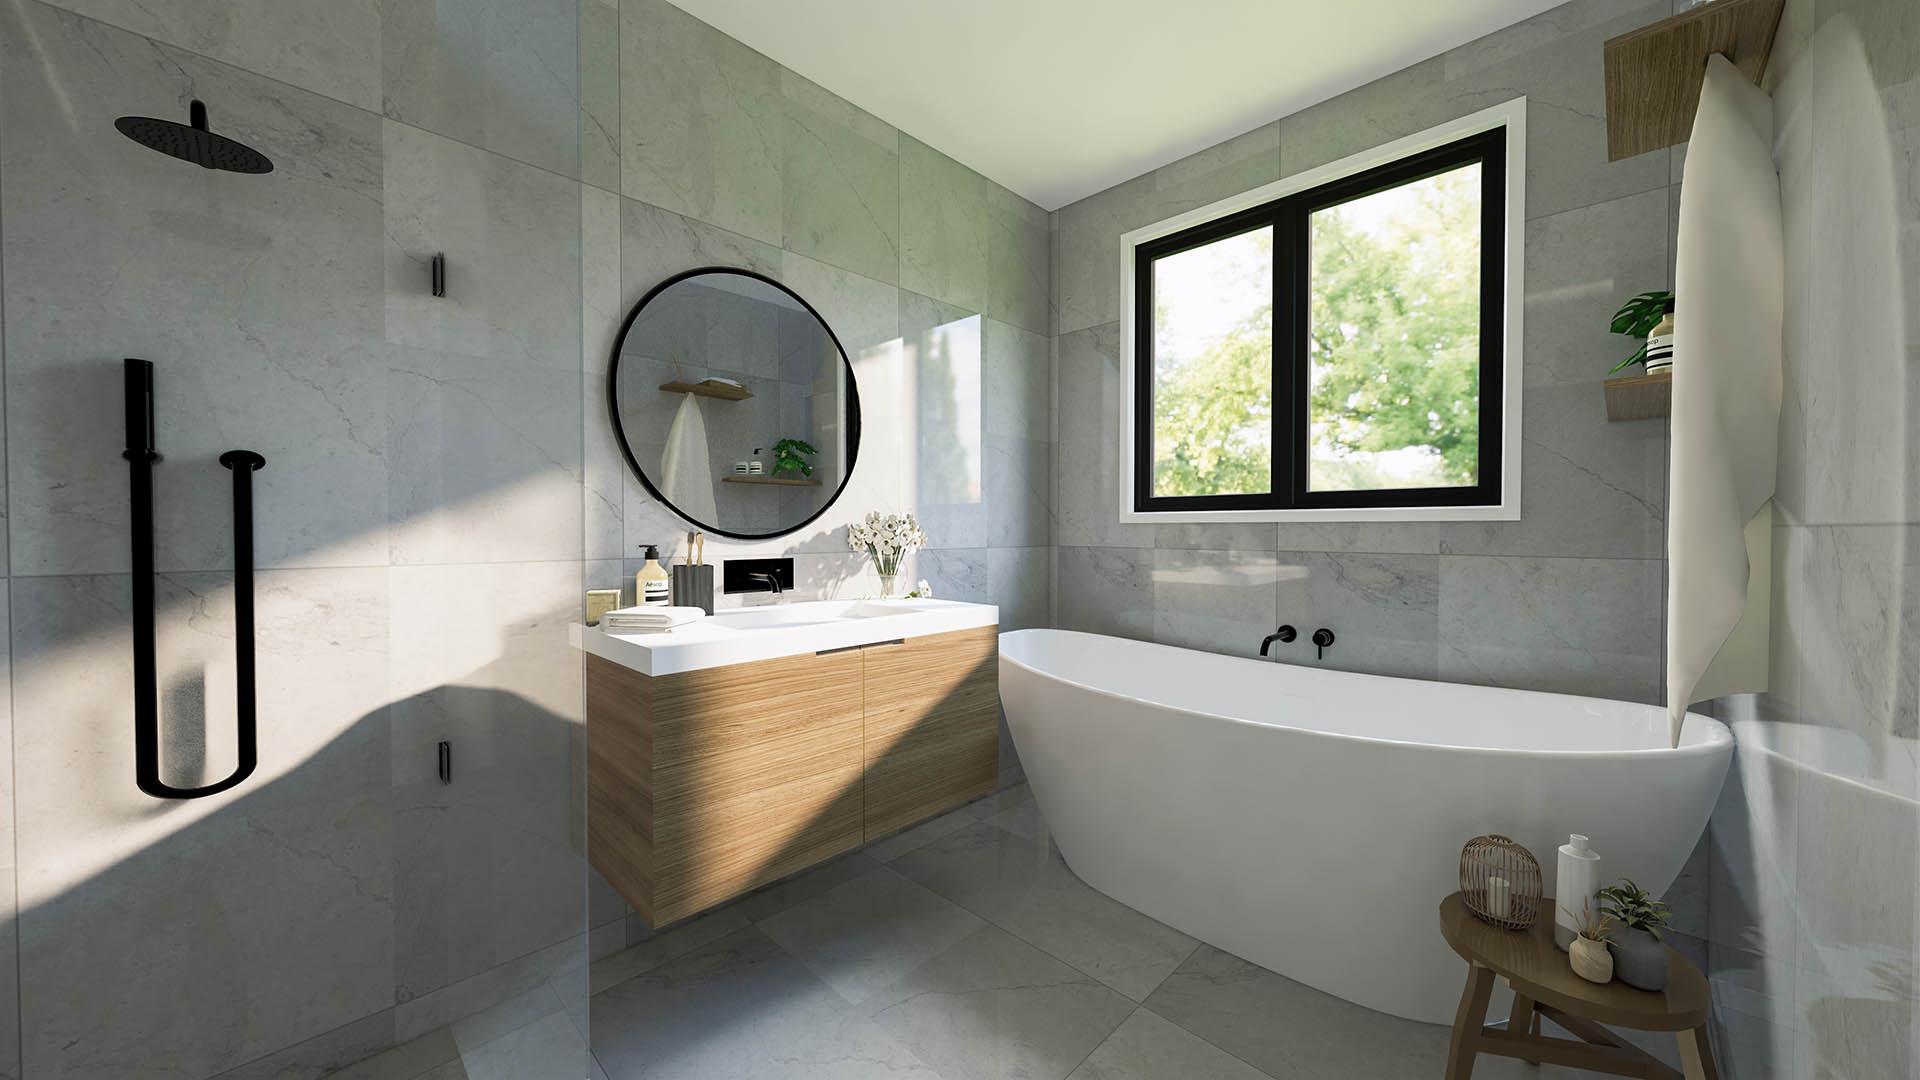 NorthIsland Bathroom